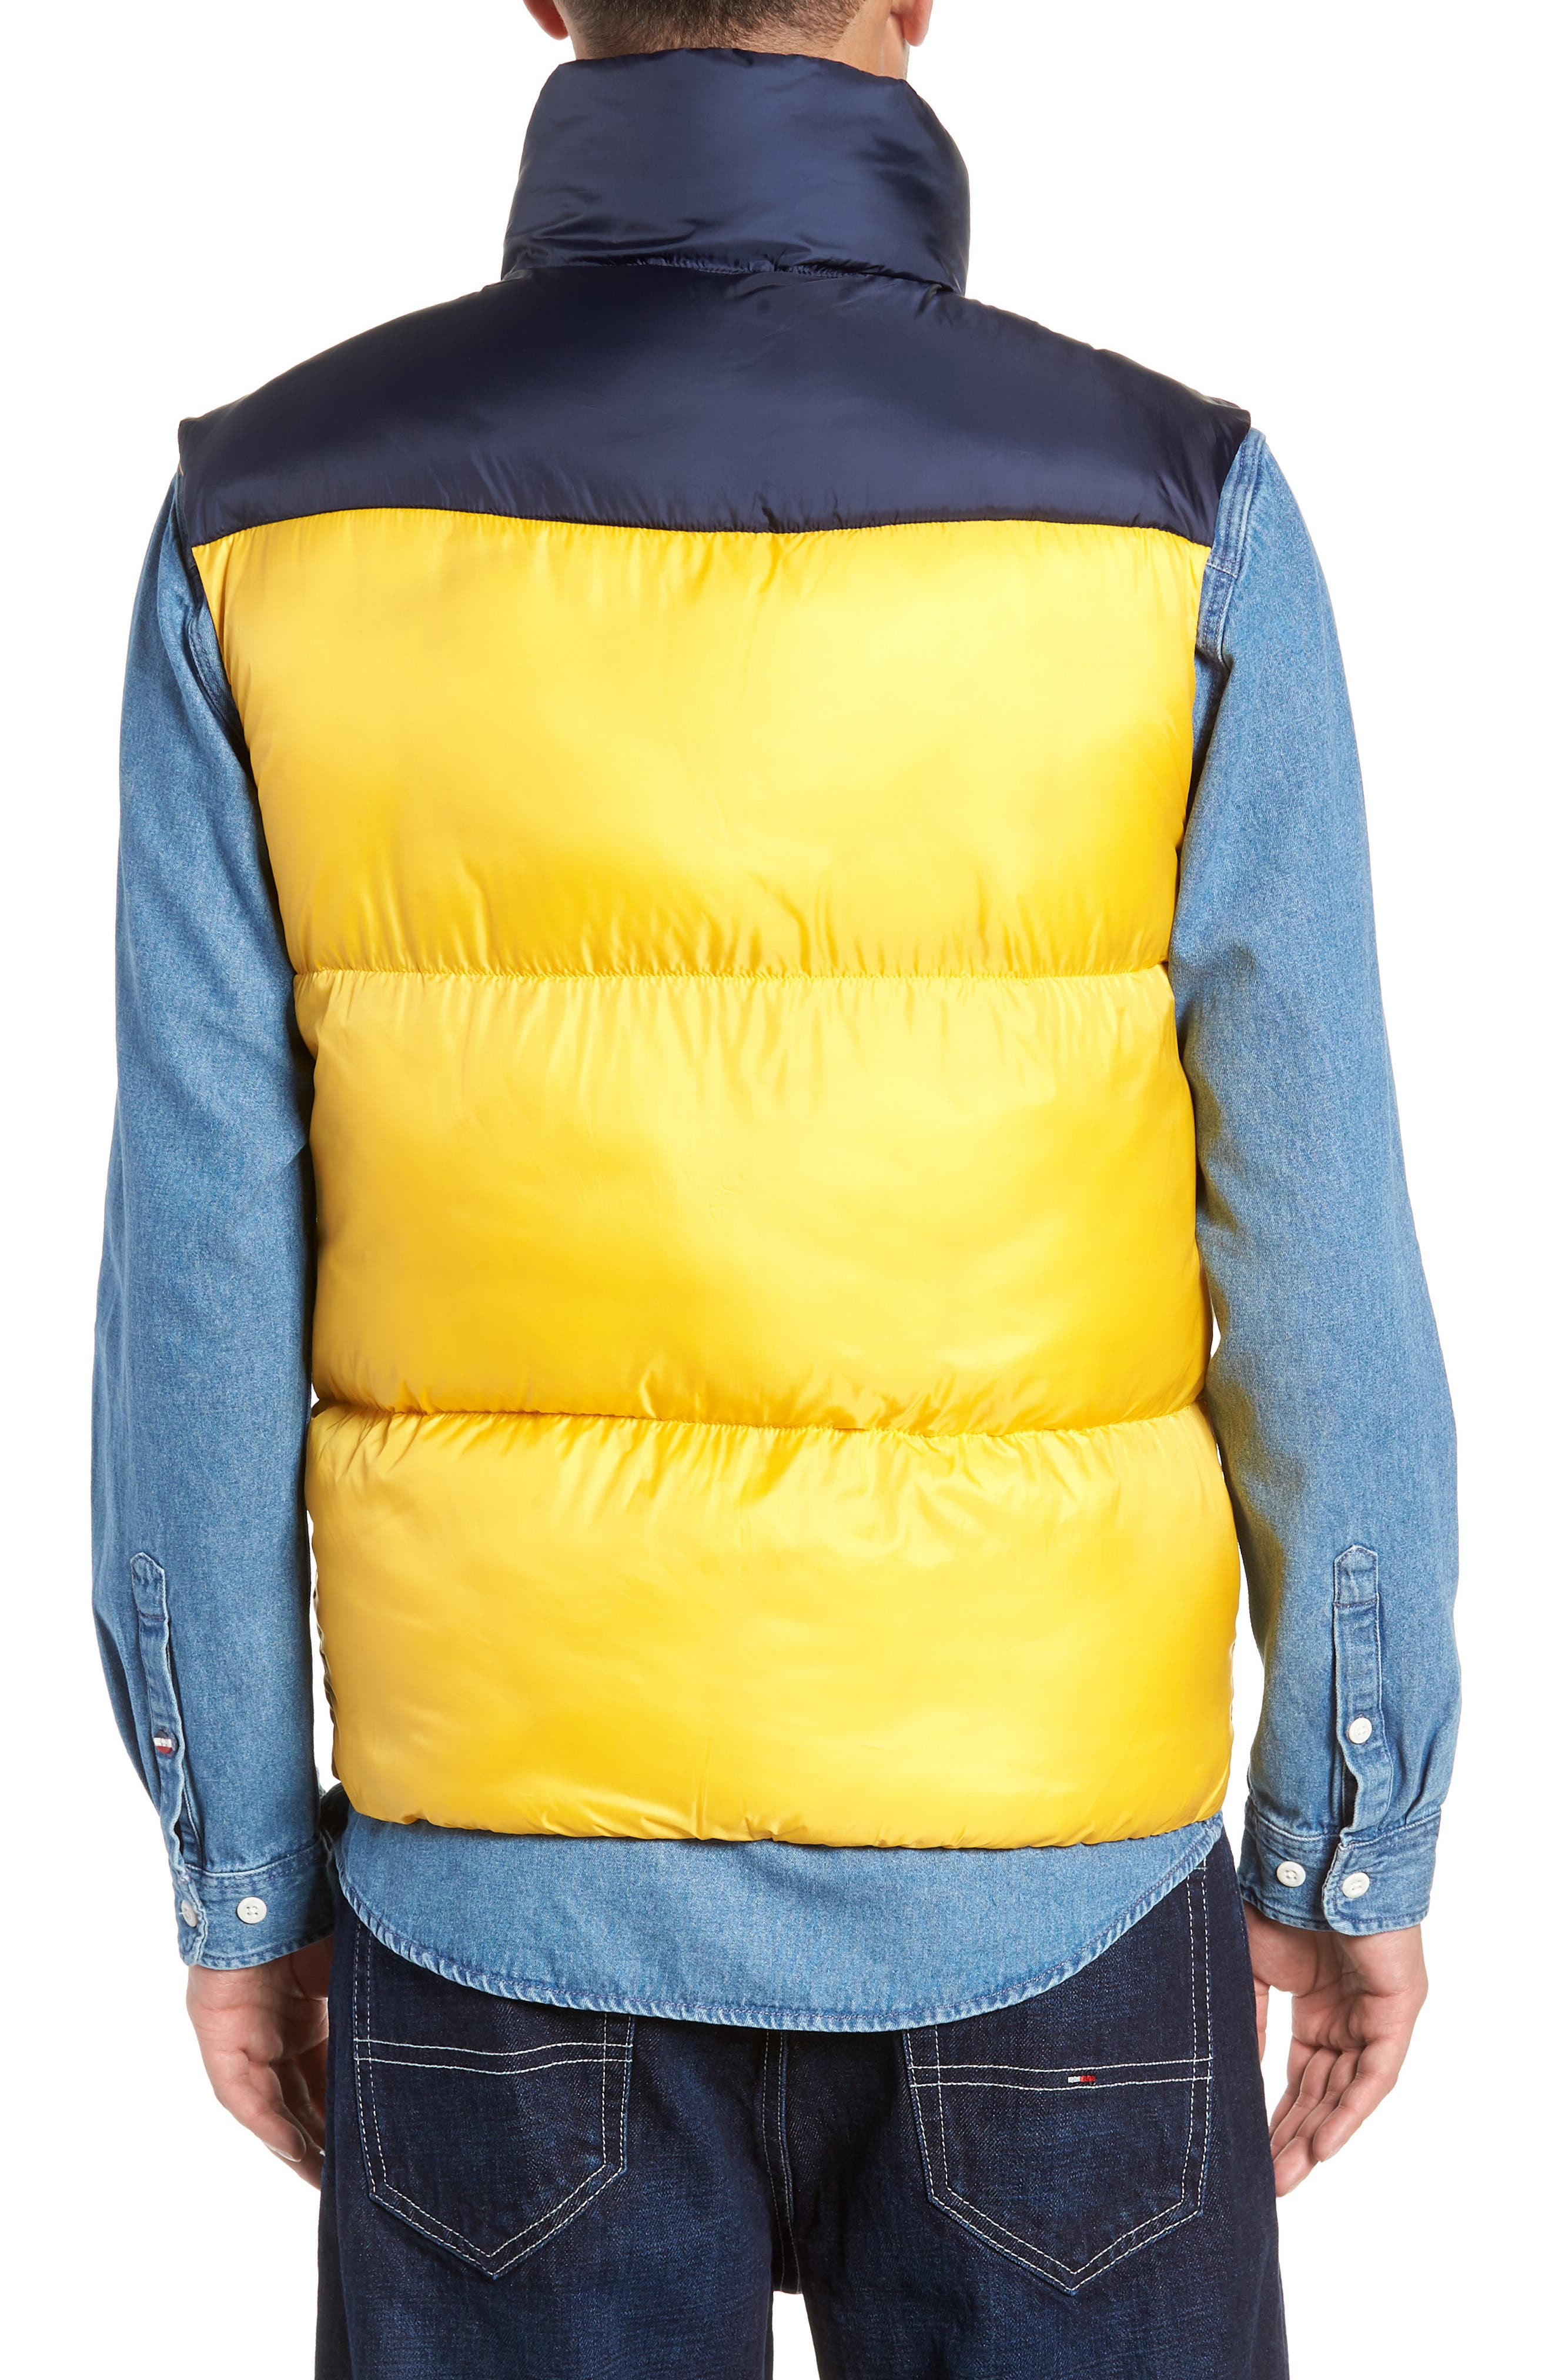 TJM Tommy Classics Vest,                             Alternate thumbnail 2, color,                             SPECTRA YELLOW / BLACK IRIS